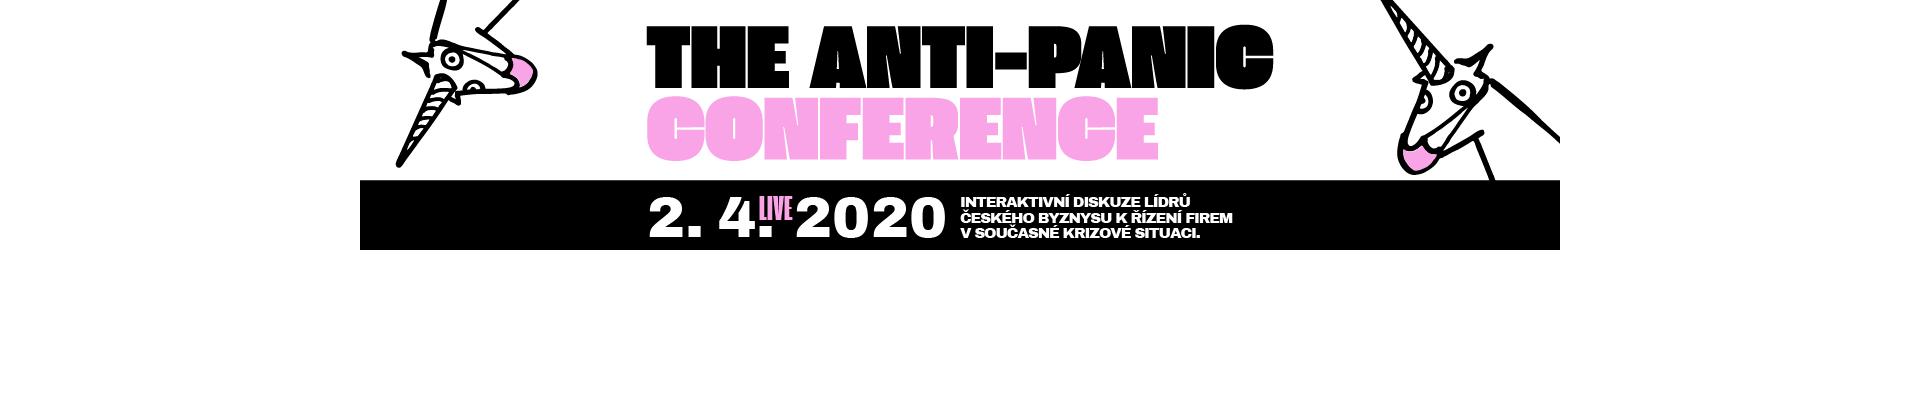 Anti-panic Live